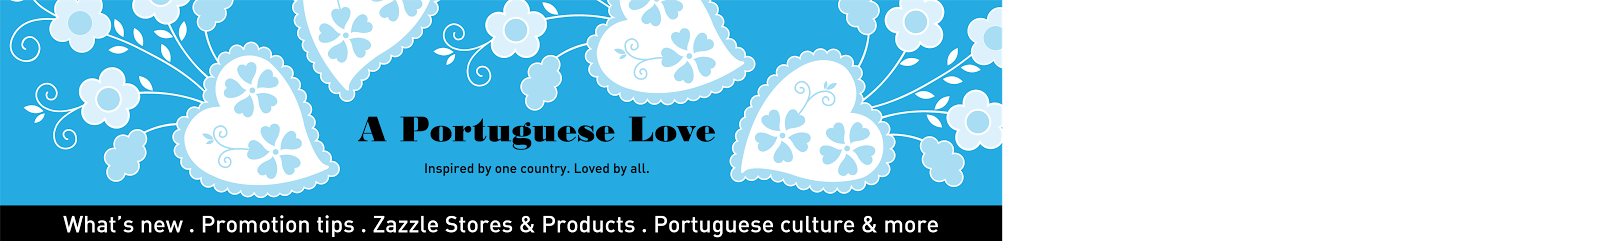 A Portuguese Love